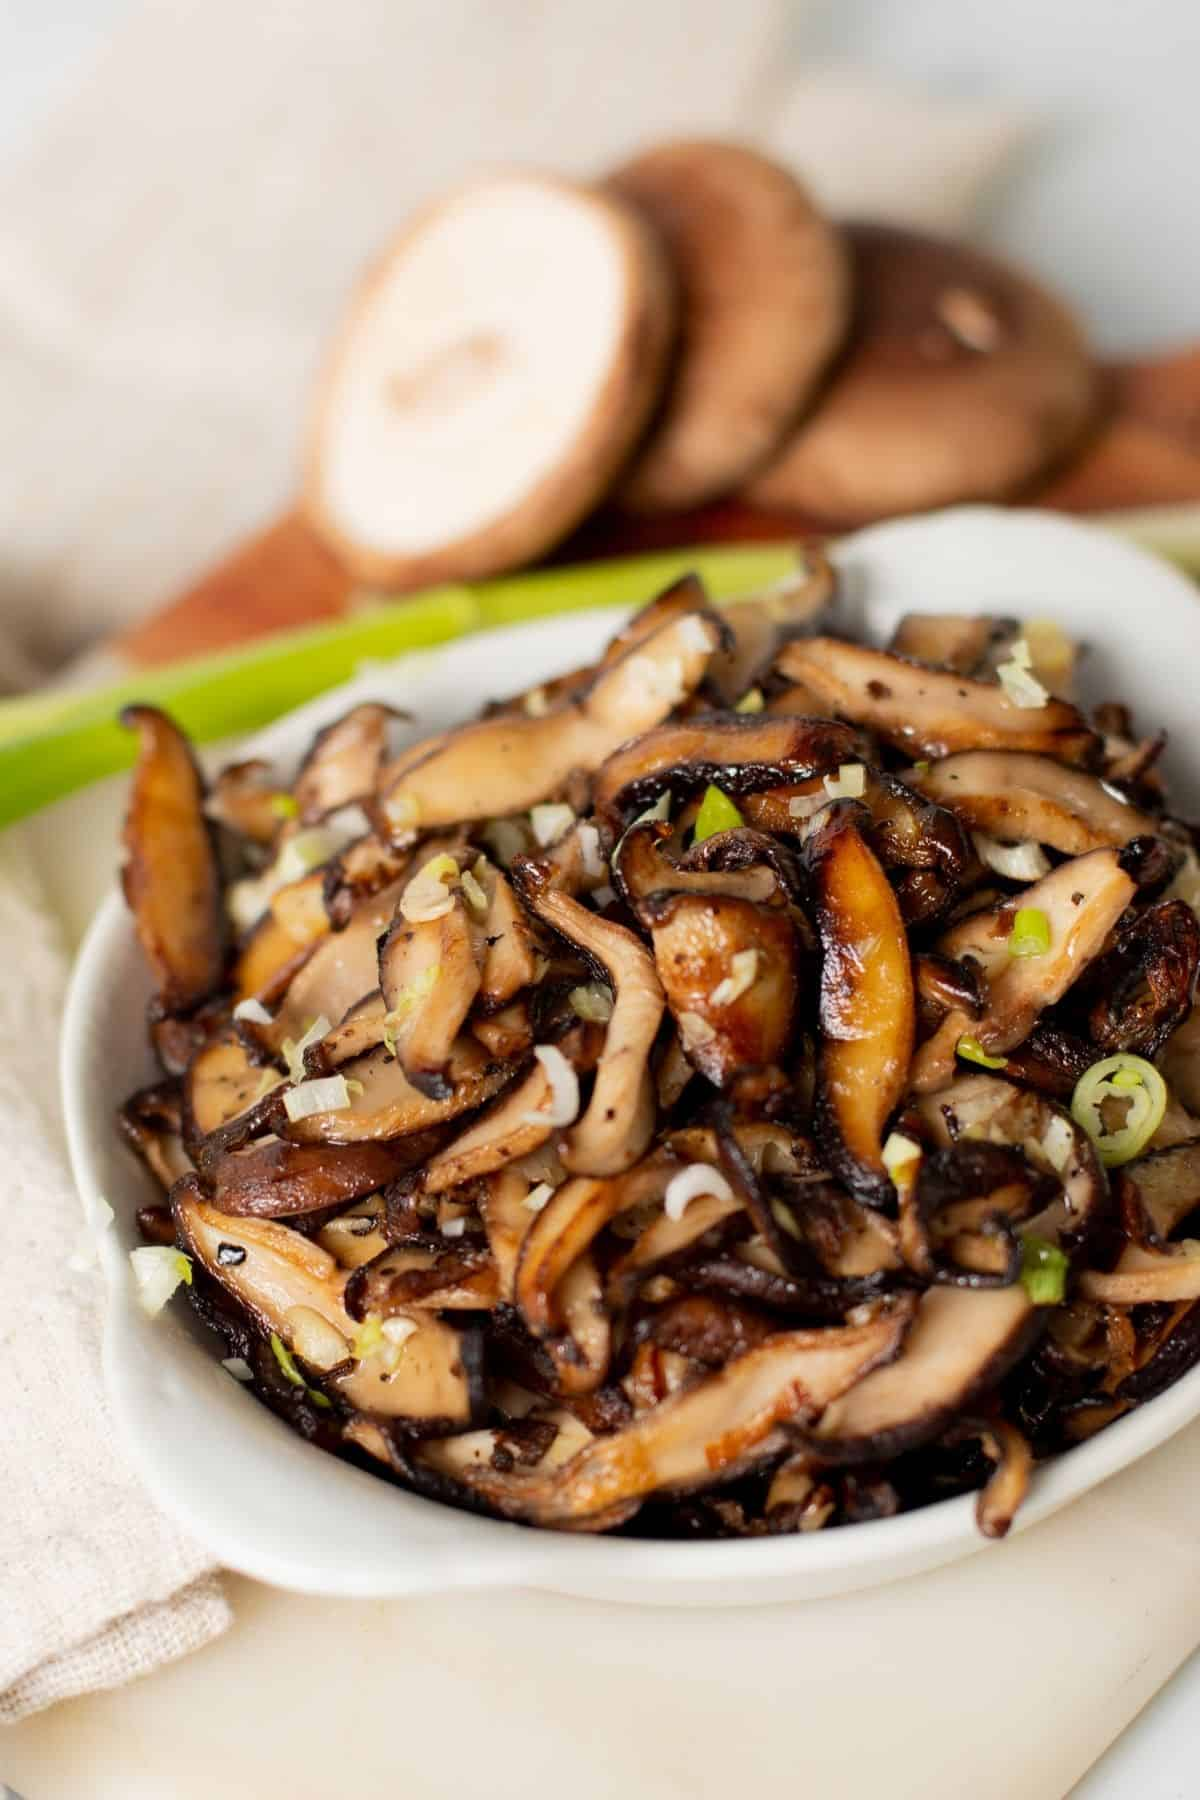 sautéed shiitake mushrooms in a small white bowl